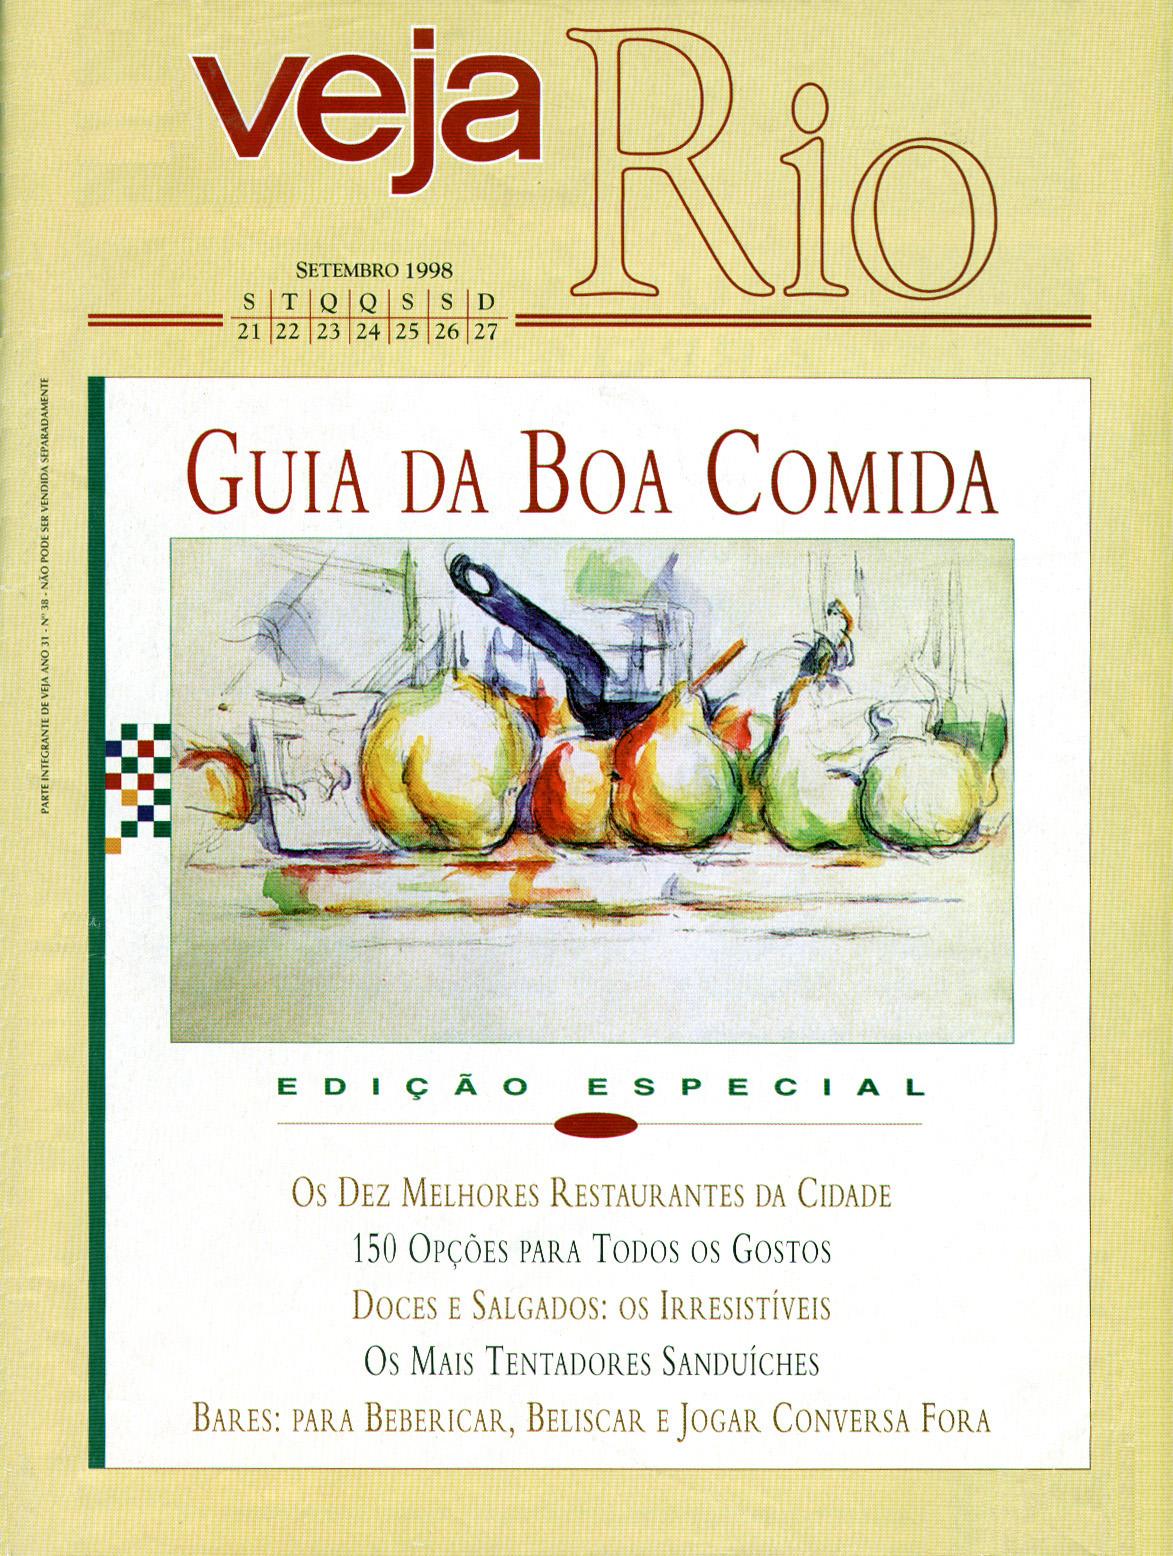 Capa da revista Veja Rio Especial Guia da Boa Comida, de 23 de setembro de 1998